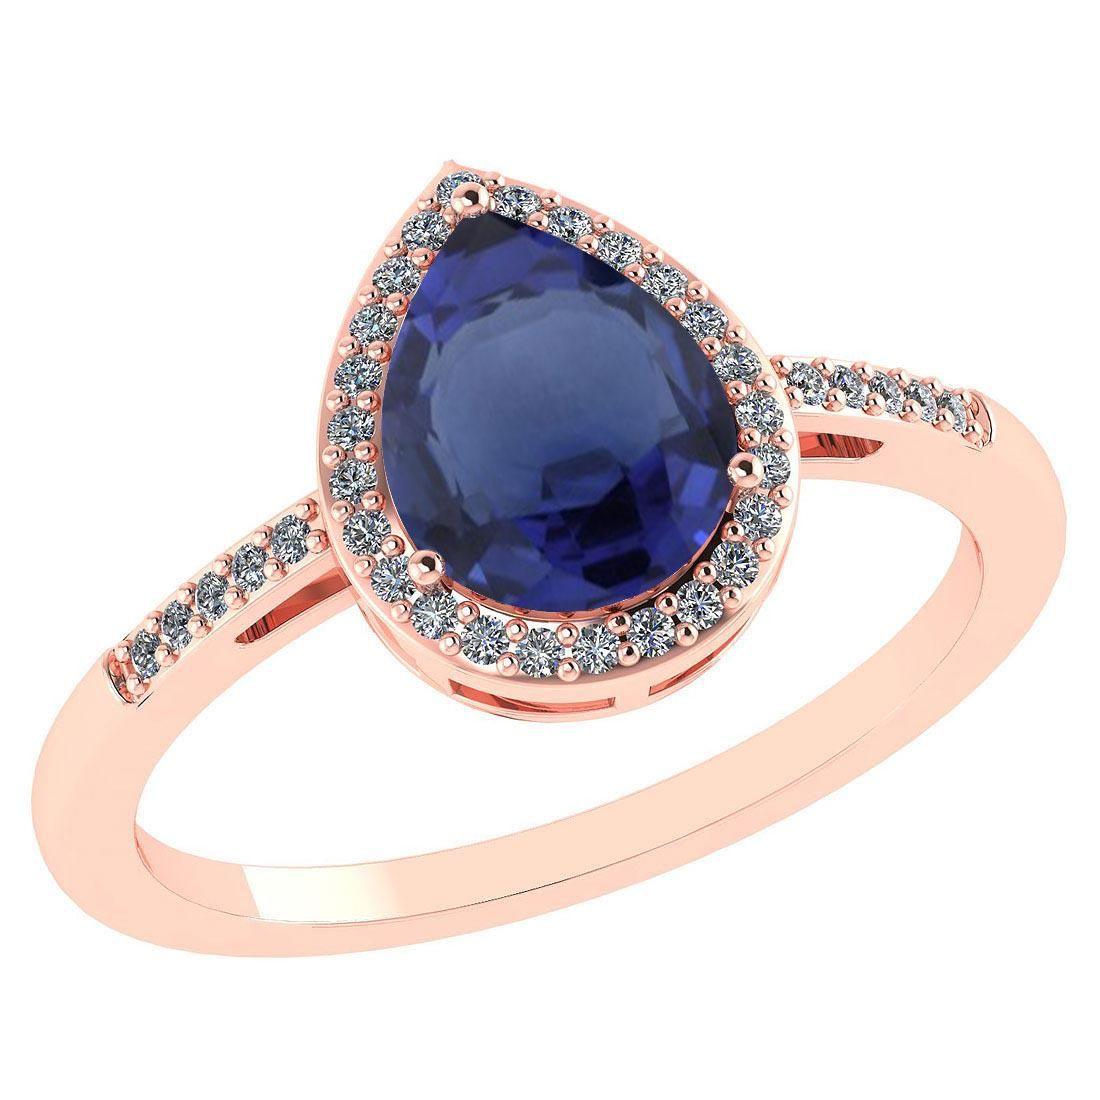 Certified 2.18 Ctw Bule Sapphire And Diamond 14k Rose G